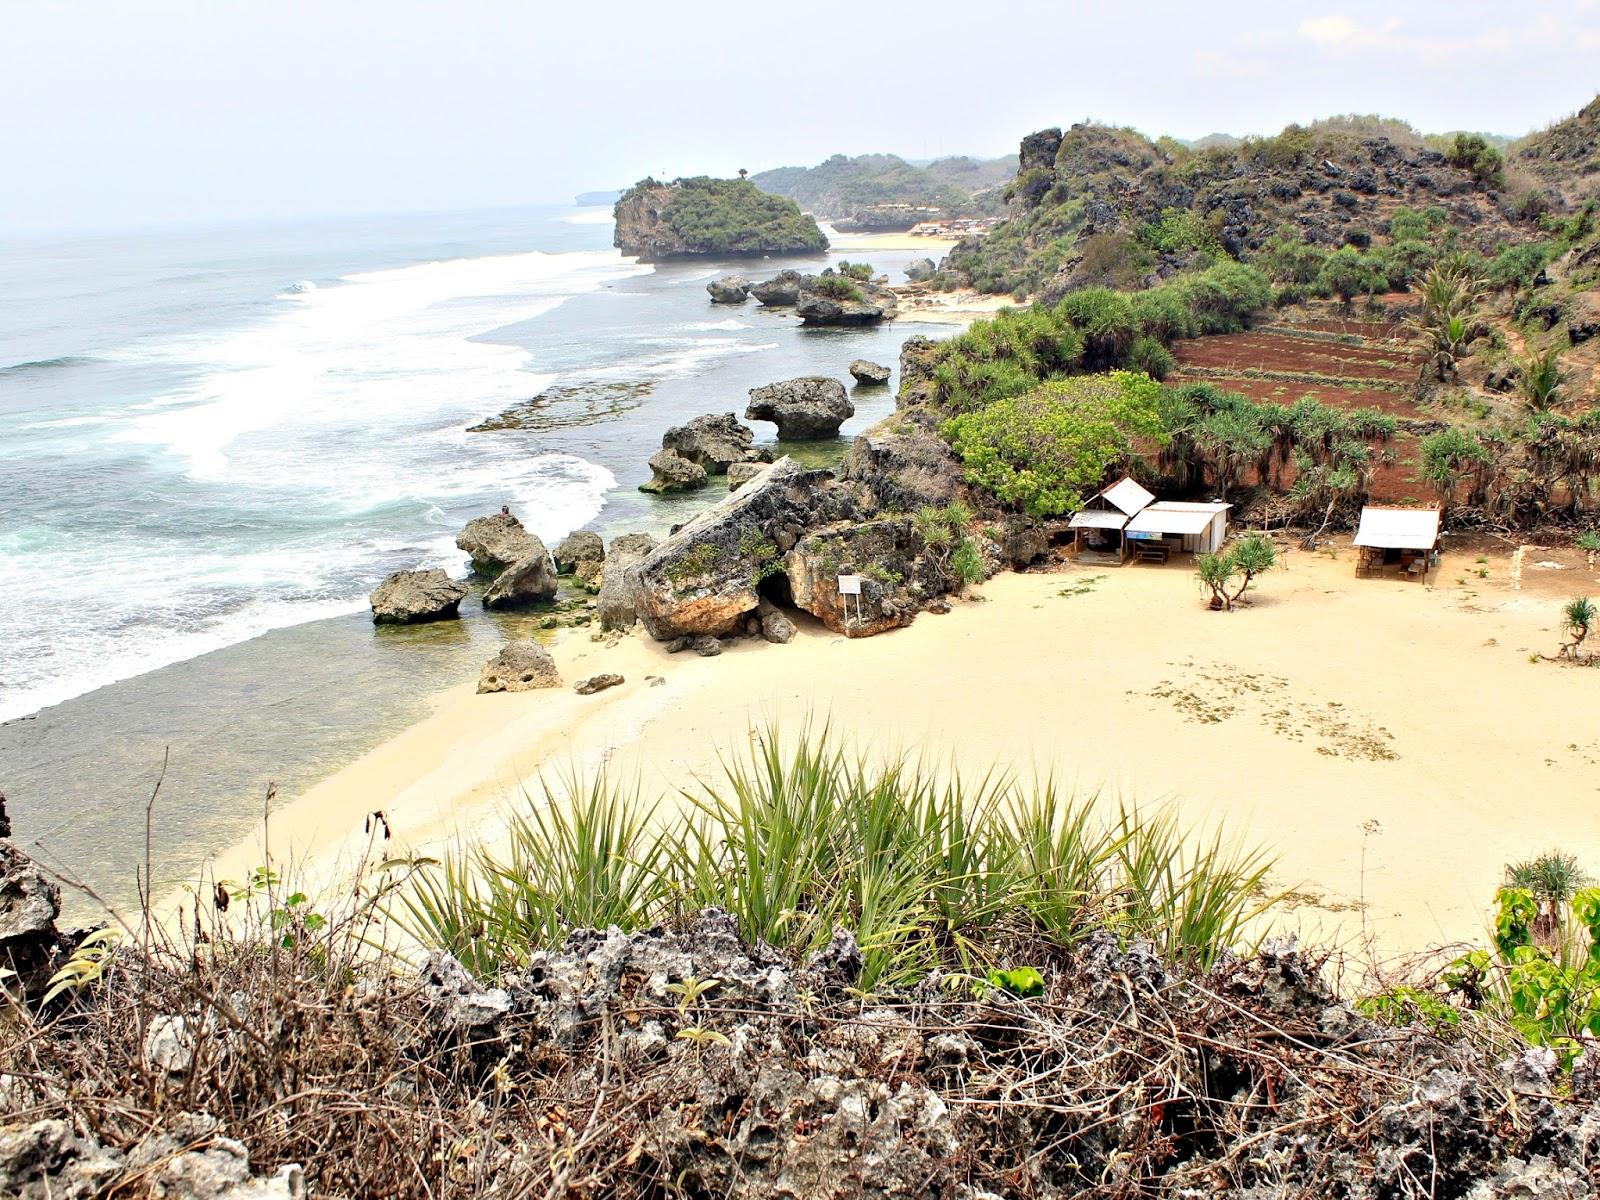 pantai ngrumput dari puncak bukit kosakora gunungkidul yogyakarta